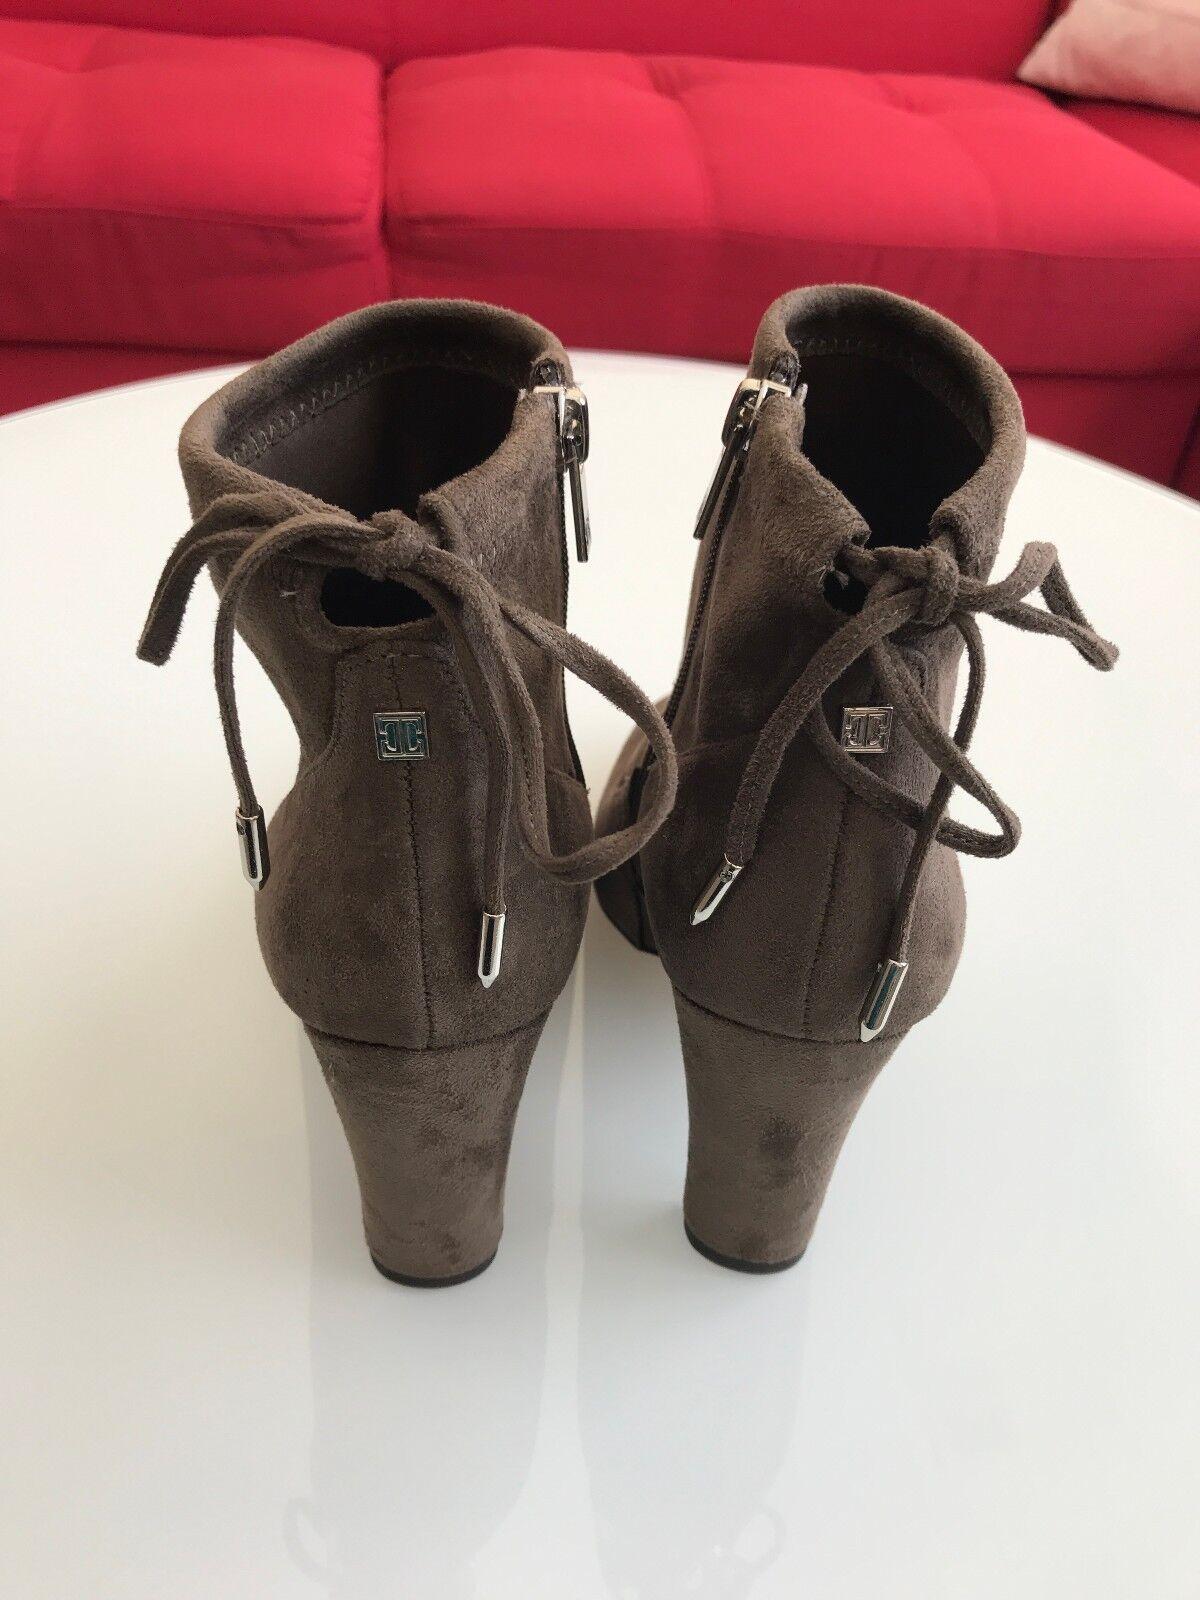 NEW Ivanka Trump Sharon High High High Heel Booties in Taupe 5c5690